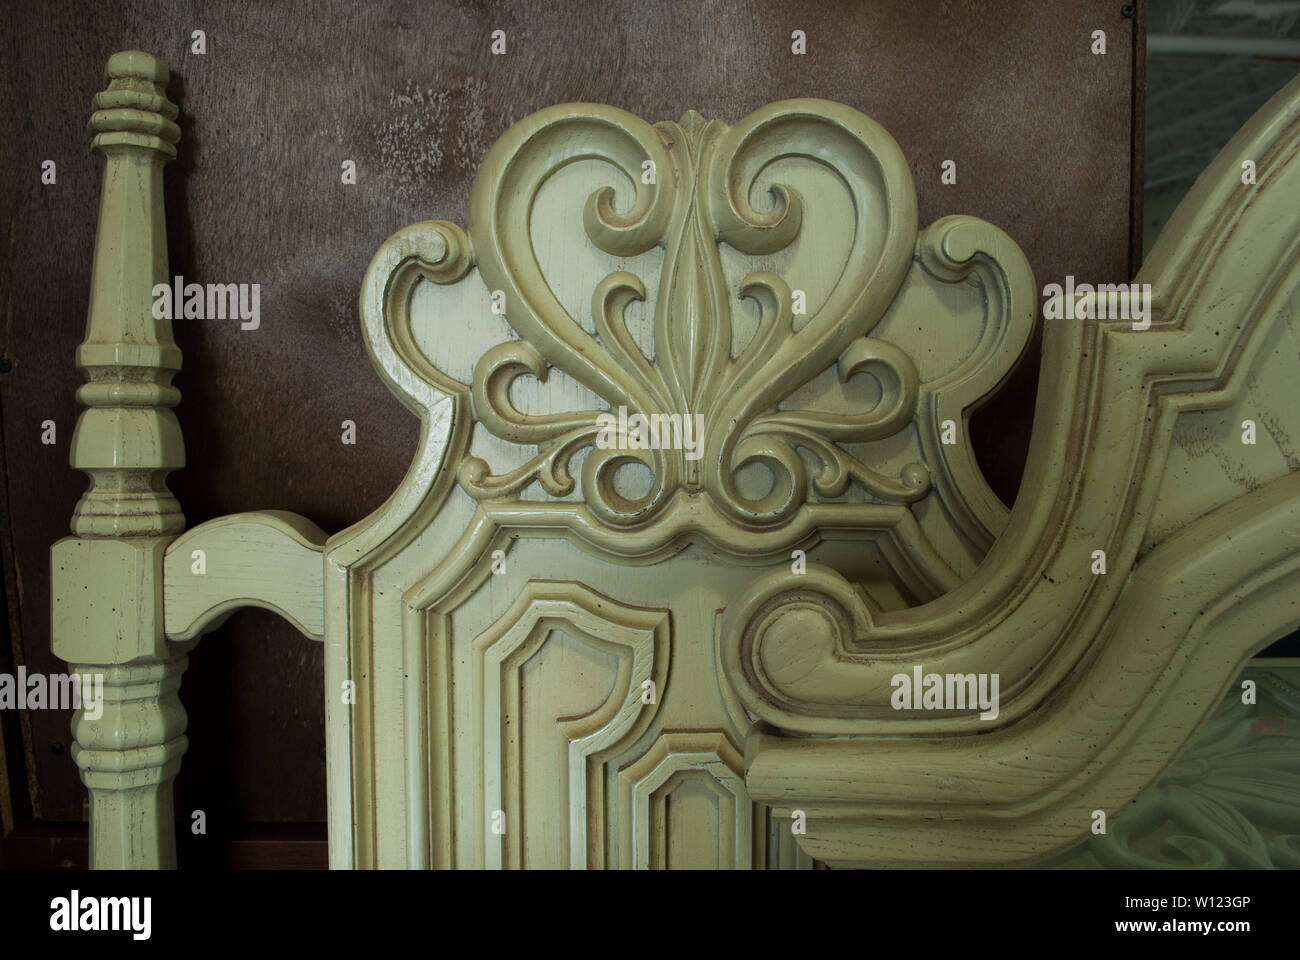 Wooden decorative element handmade. Vintage decorative pattern. Aged ornamental piece of wood - Stock Image